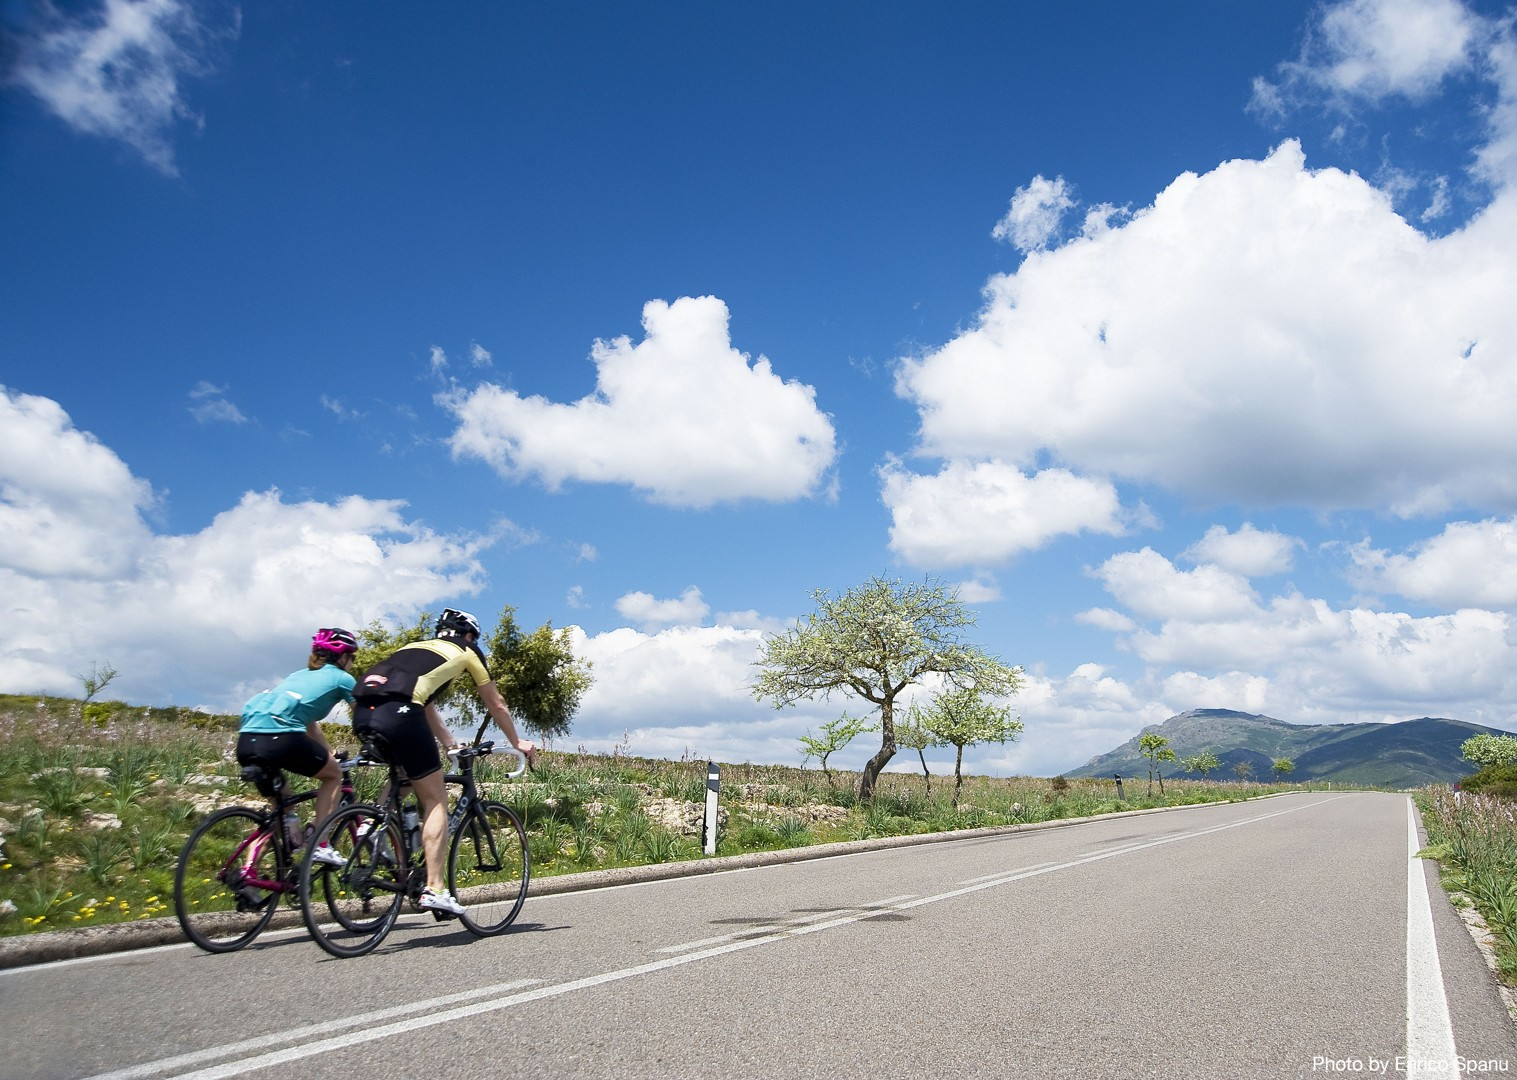 Road-Cycling-Holiday-Italy-Sardinia-Sardinian-Mountains-Flumendosa-Valley.jpg - Italy - Sardinia - Sardinian Mountains - Guided Road Cycling Holiday - Italia Road Cycling